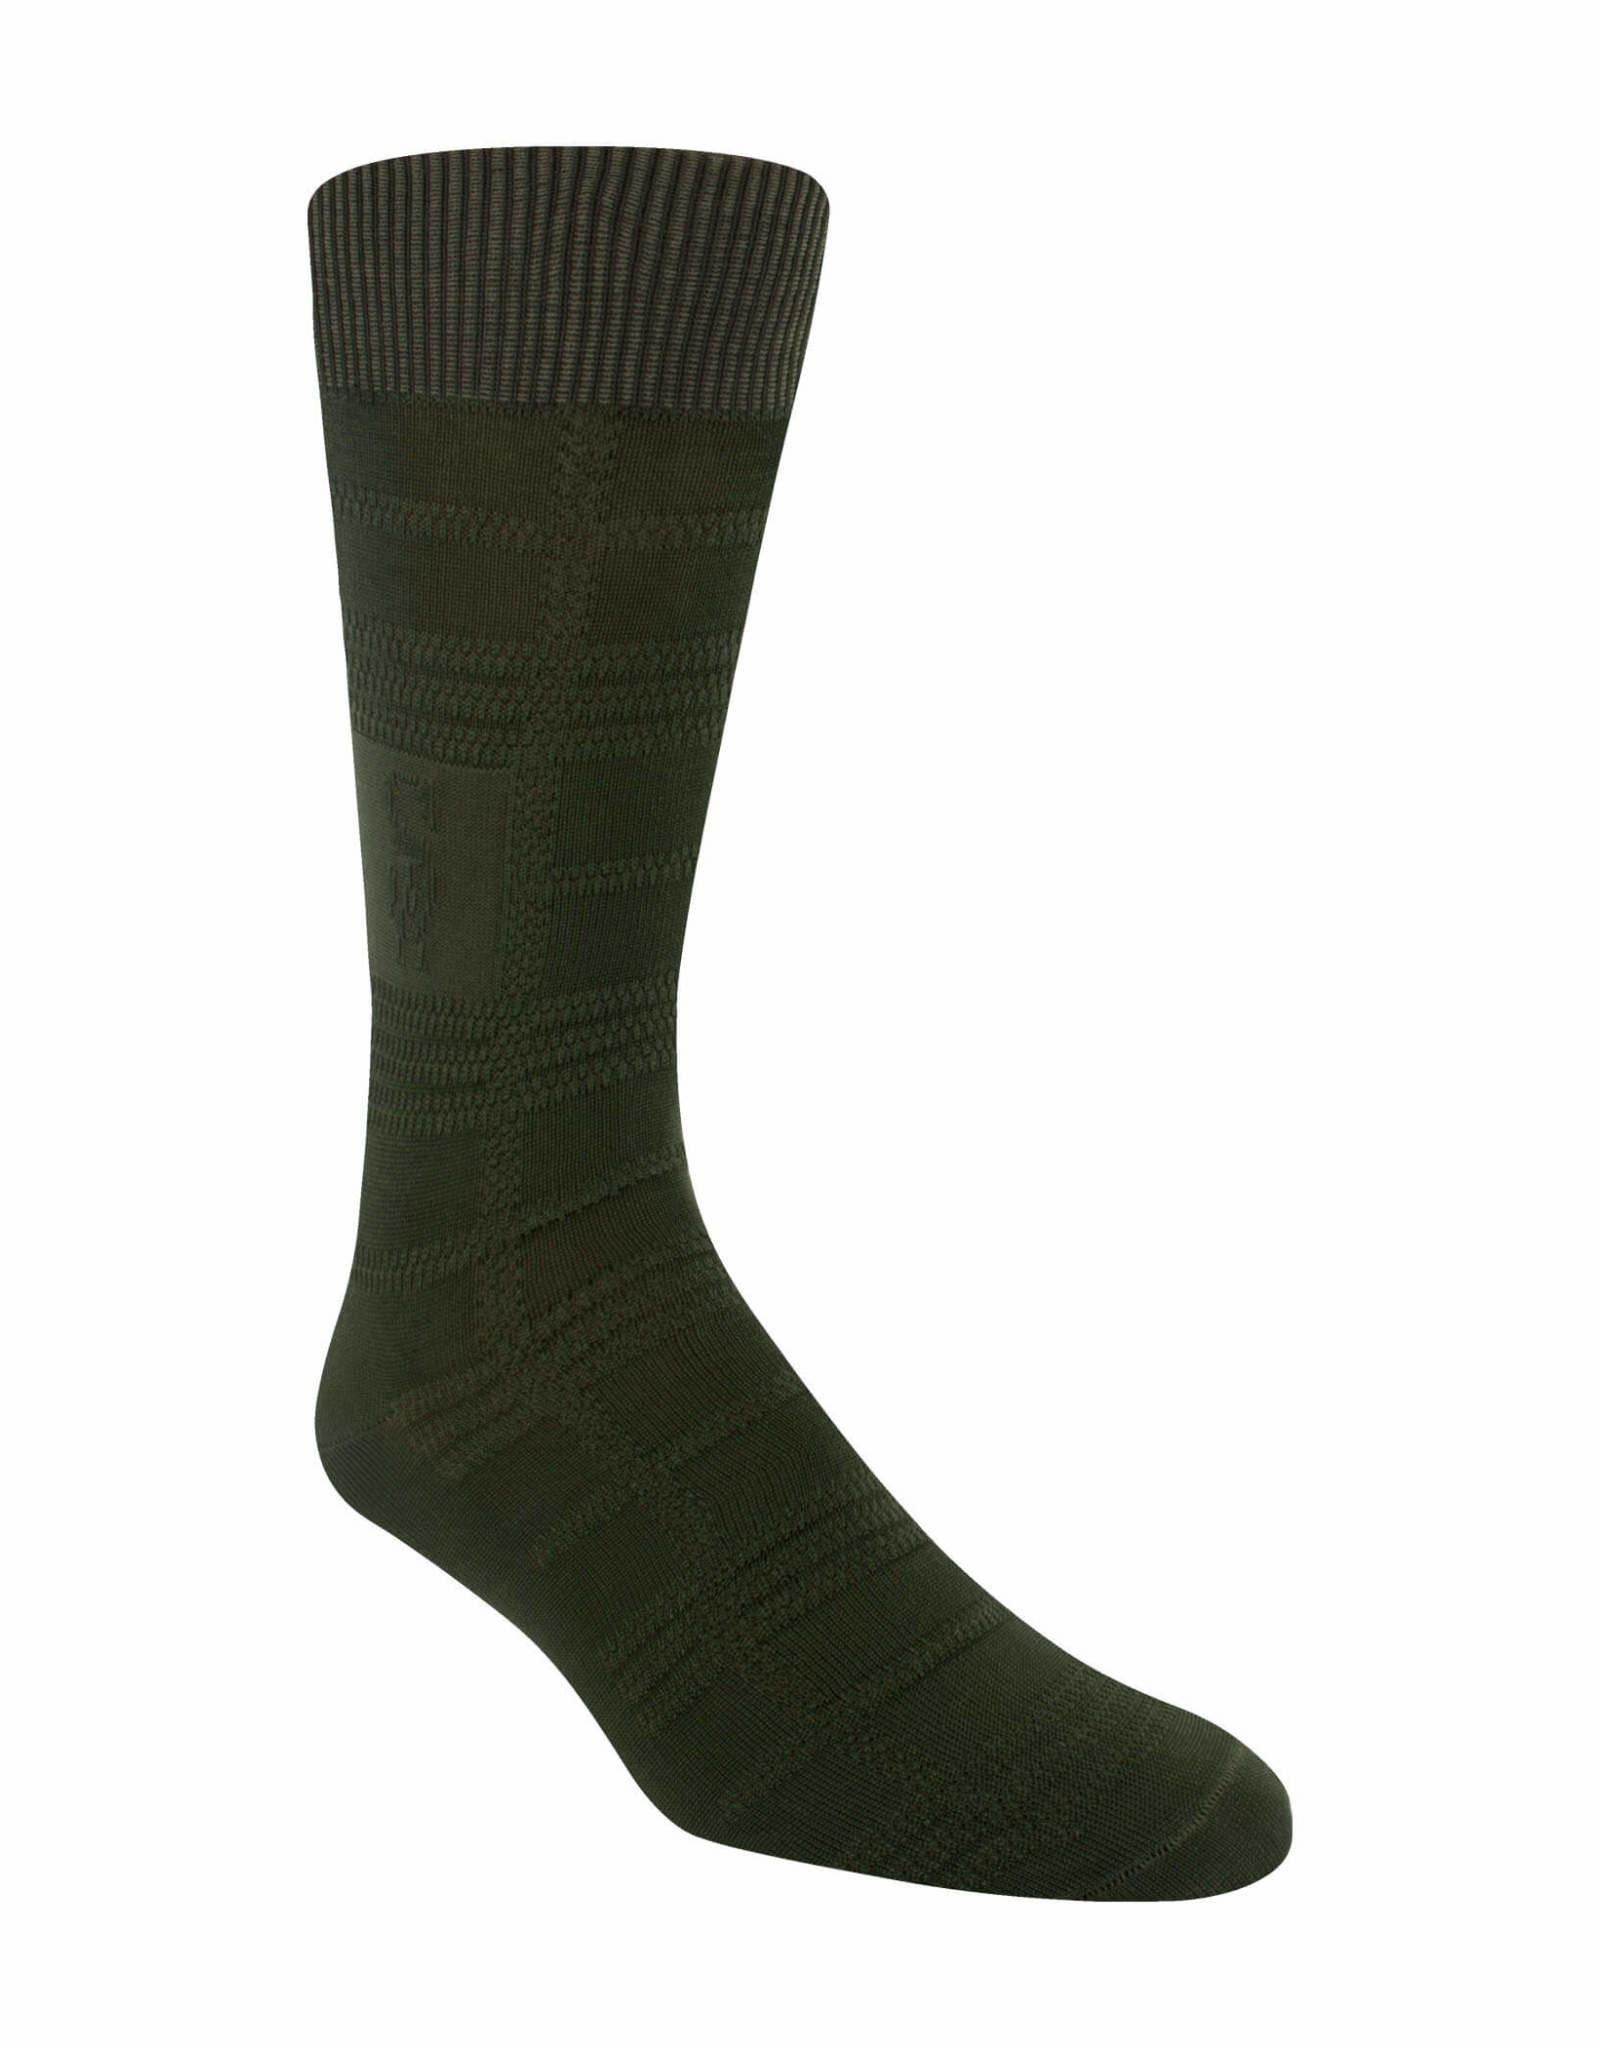 Stacy Adams Socks Stacy Adams Gemstone For Size 8-13 Olive